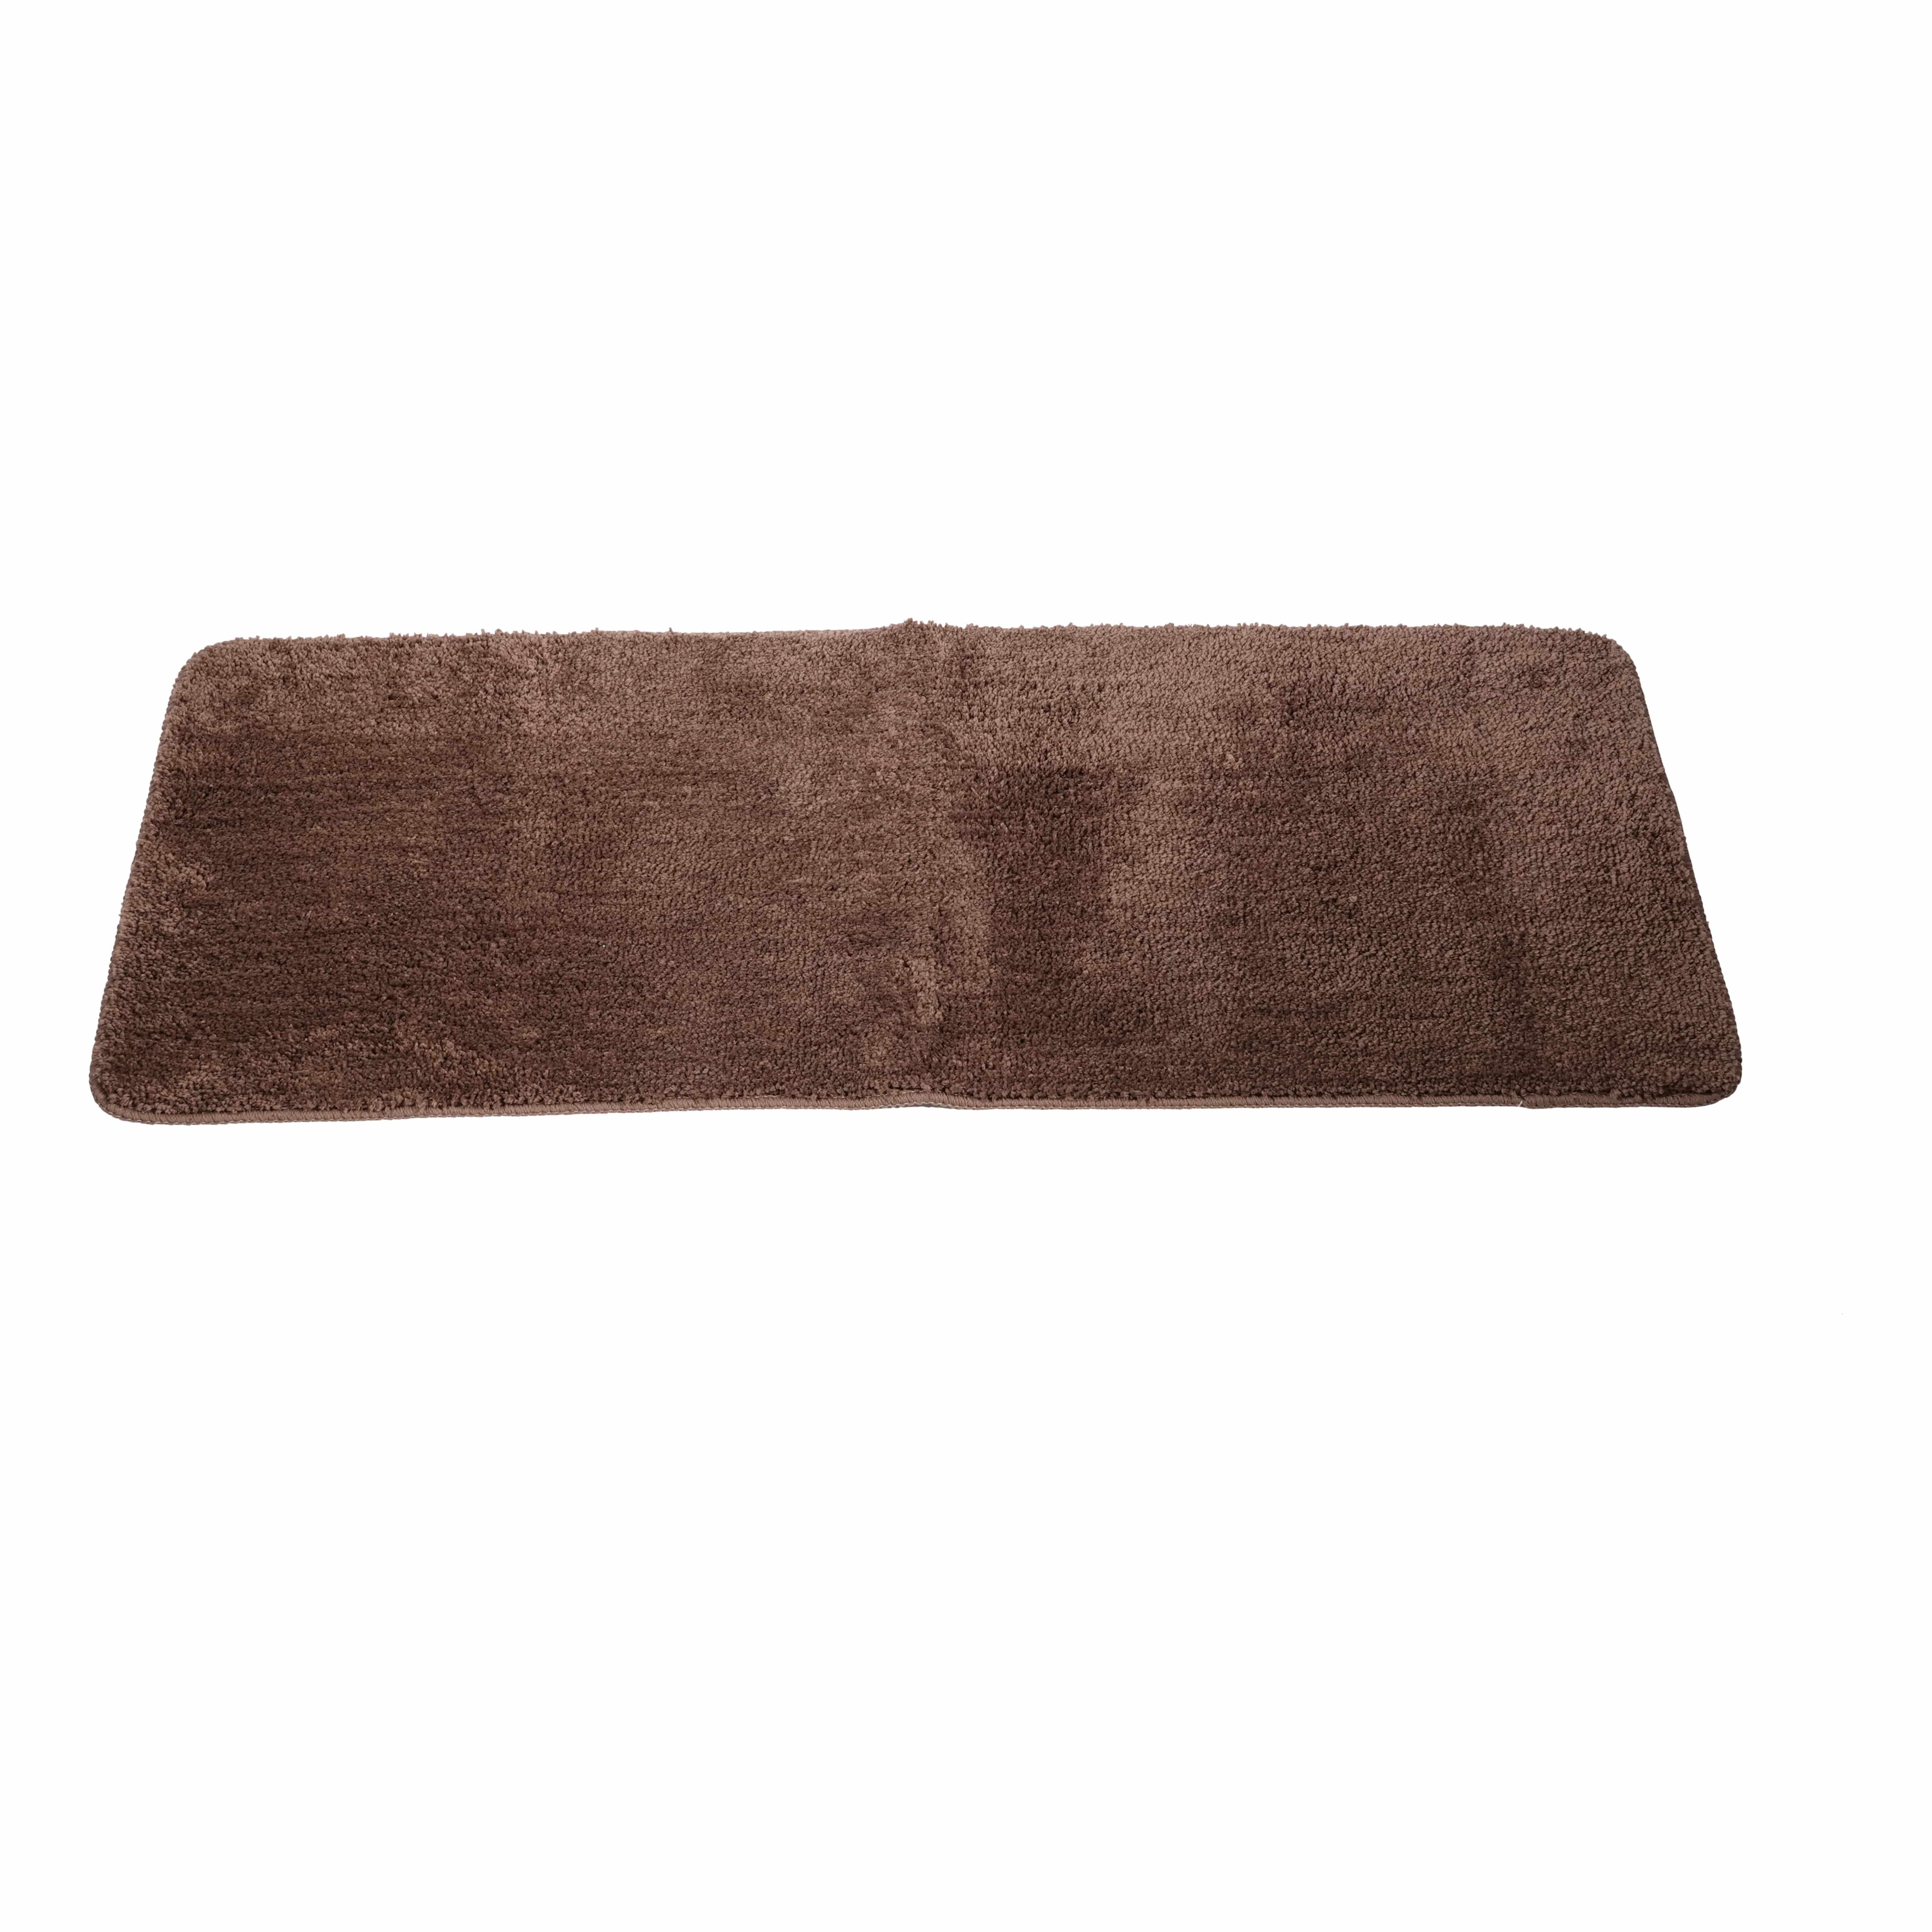 4goodz Anti-slip Douchemat voor dubbele wasbak 50x120 cm - Bruin